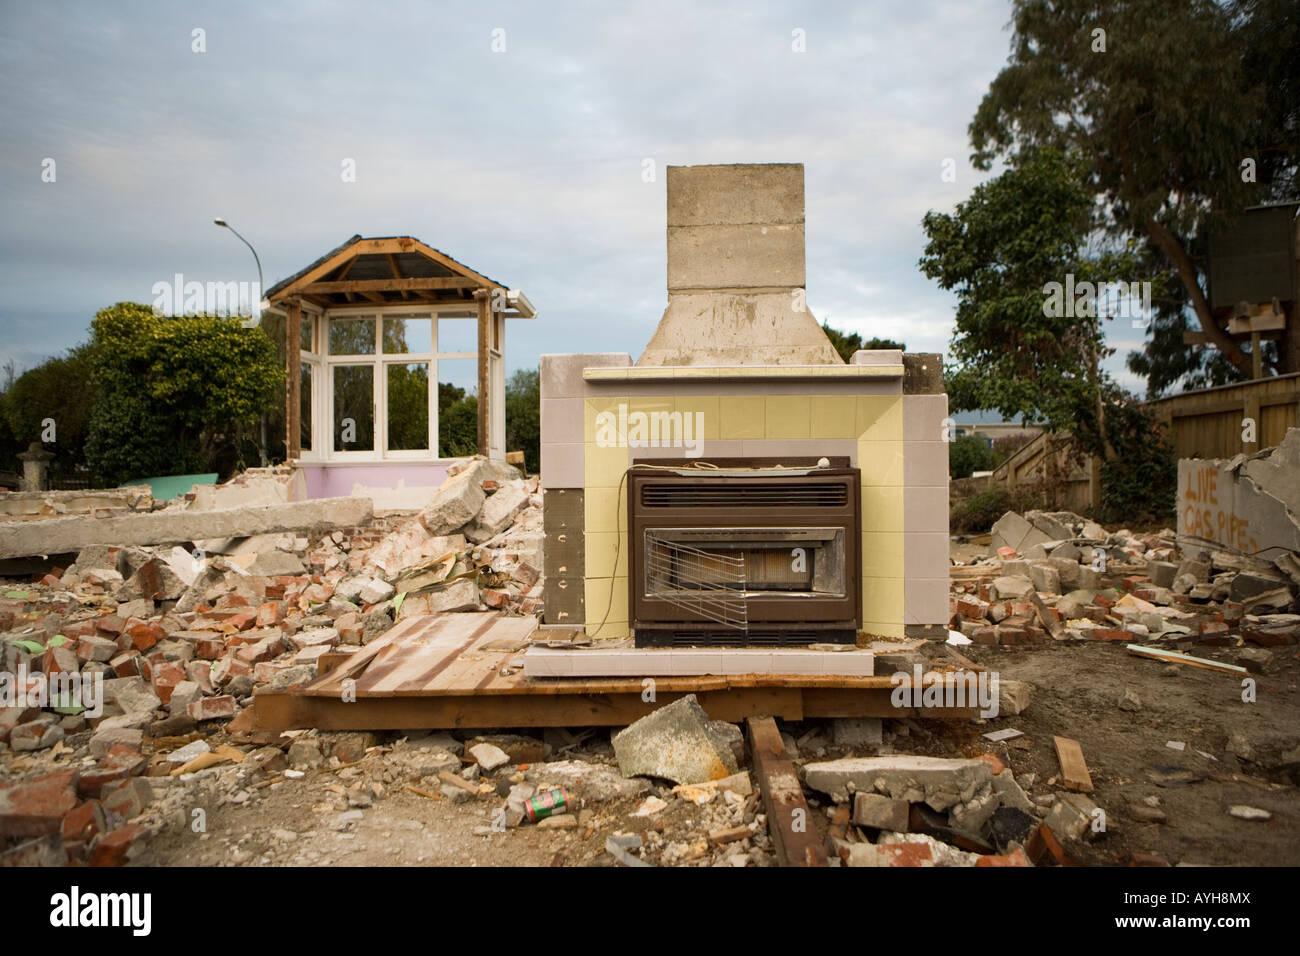 Demolished house Palmerston North New Zealand - Stock Image